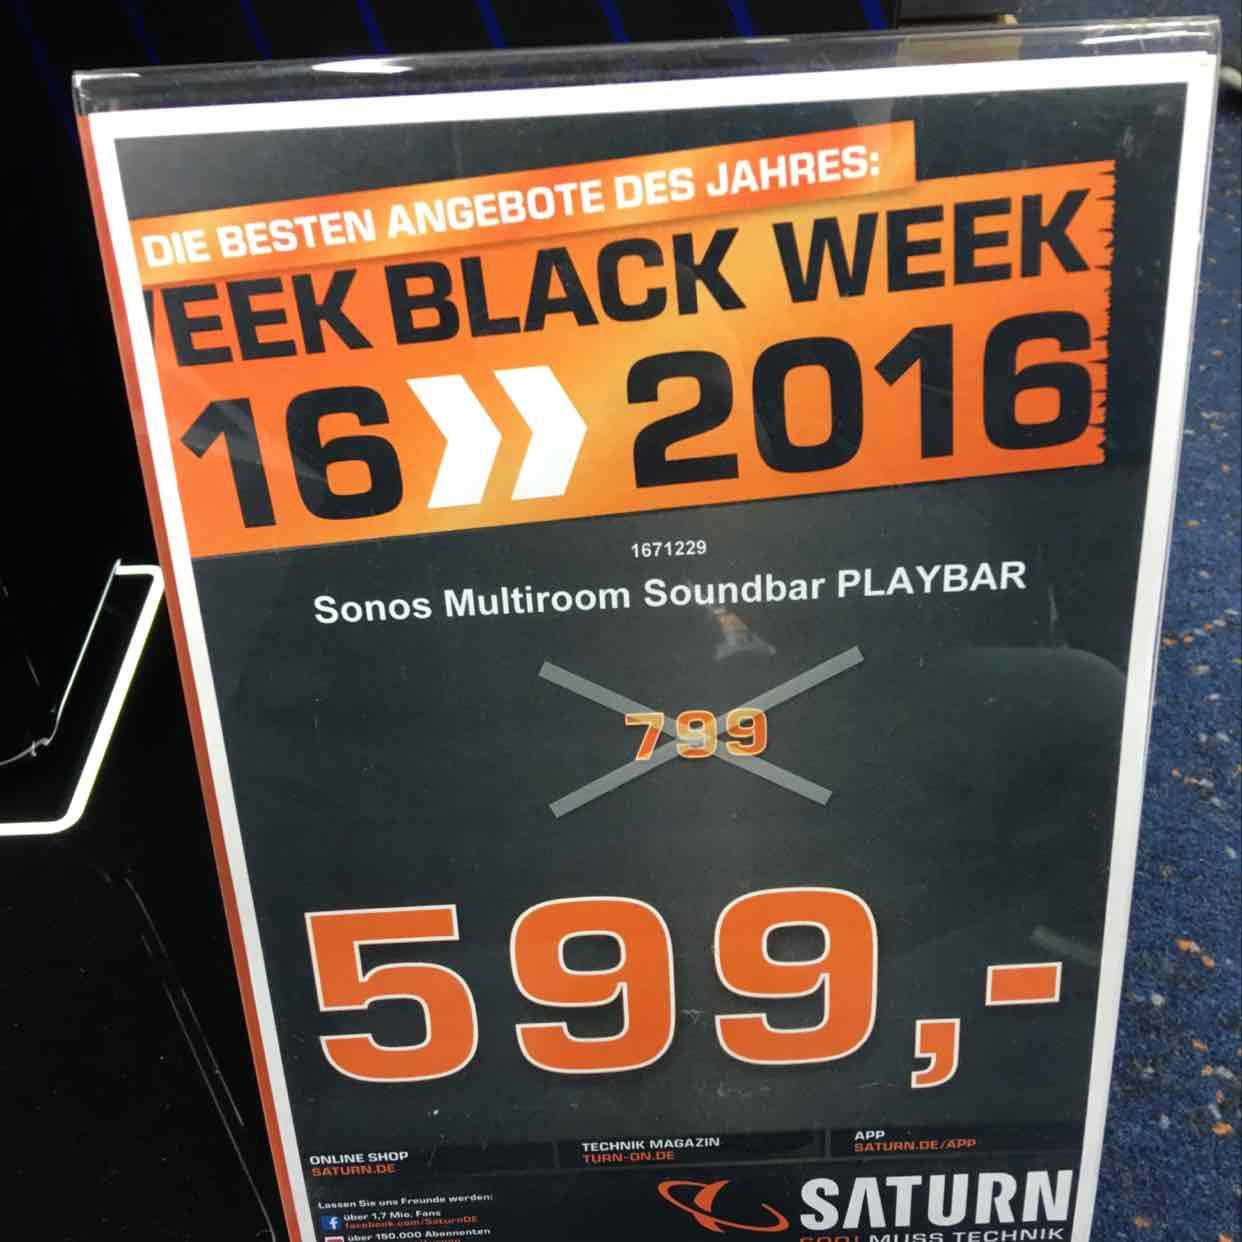 (Lokal) Saturn Stuttgart, Sonos Playbar für 599,-